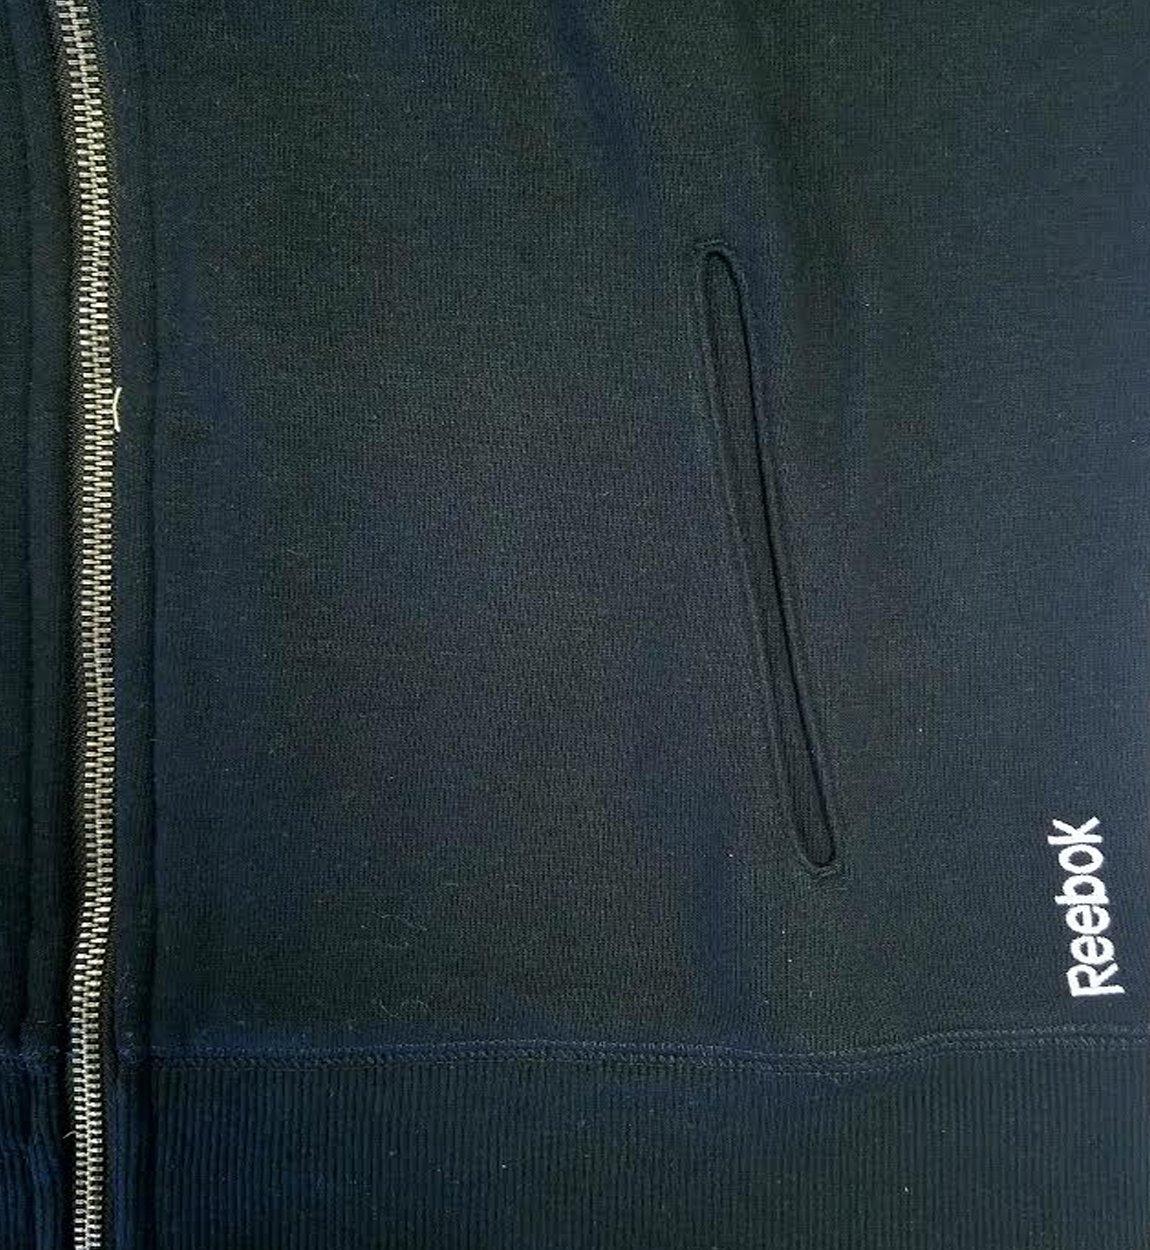 RW315813 Reebok Womens Stripe Trim Full Zip Dolman Hood